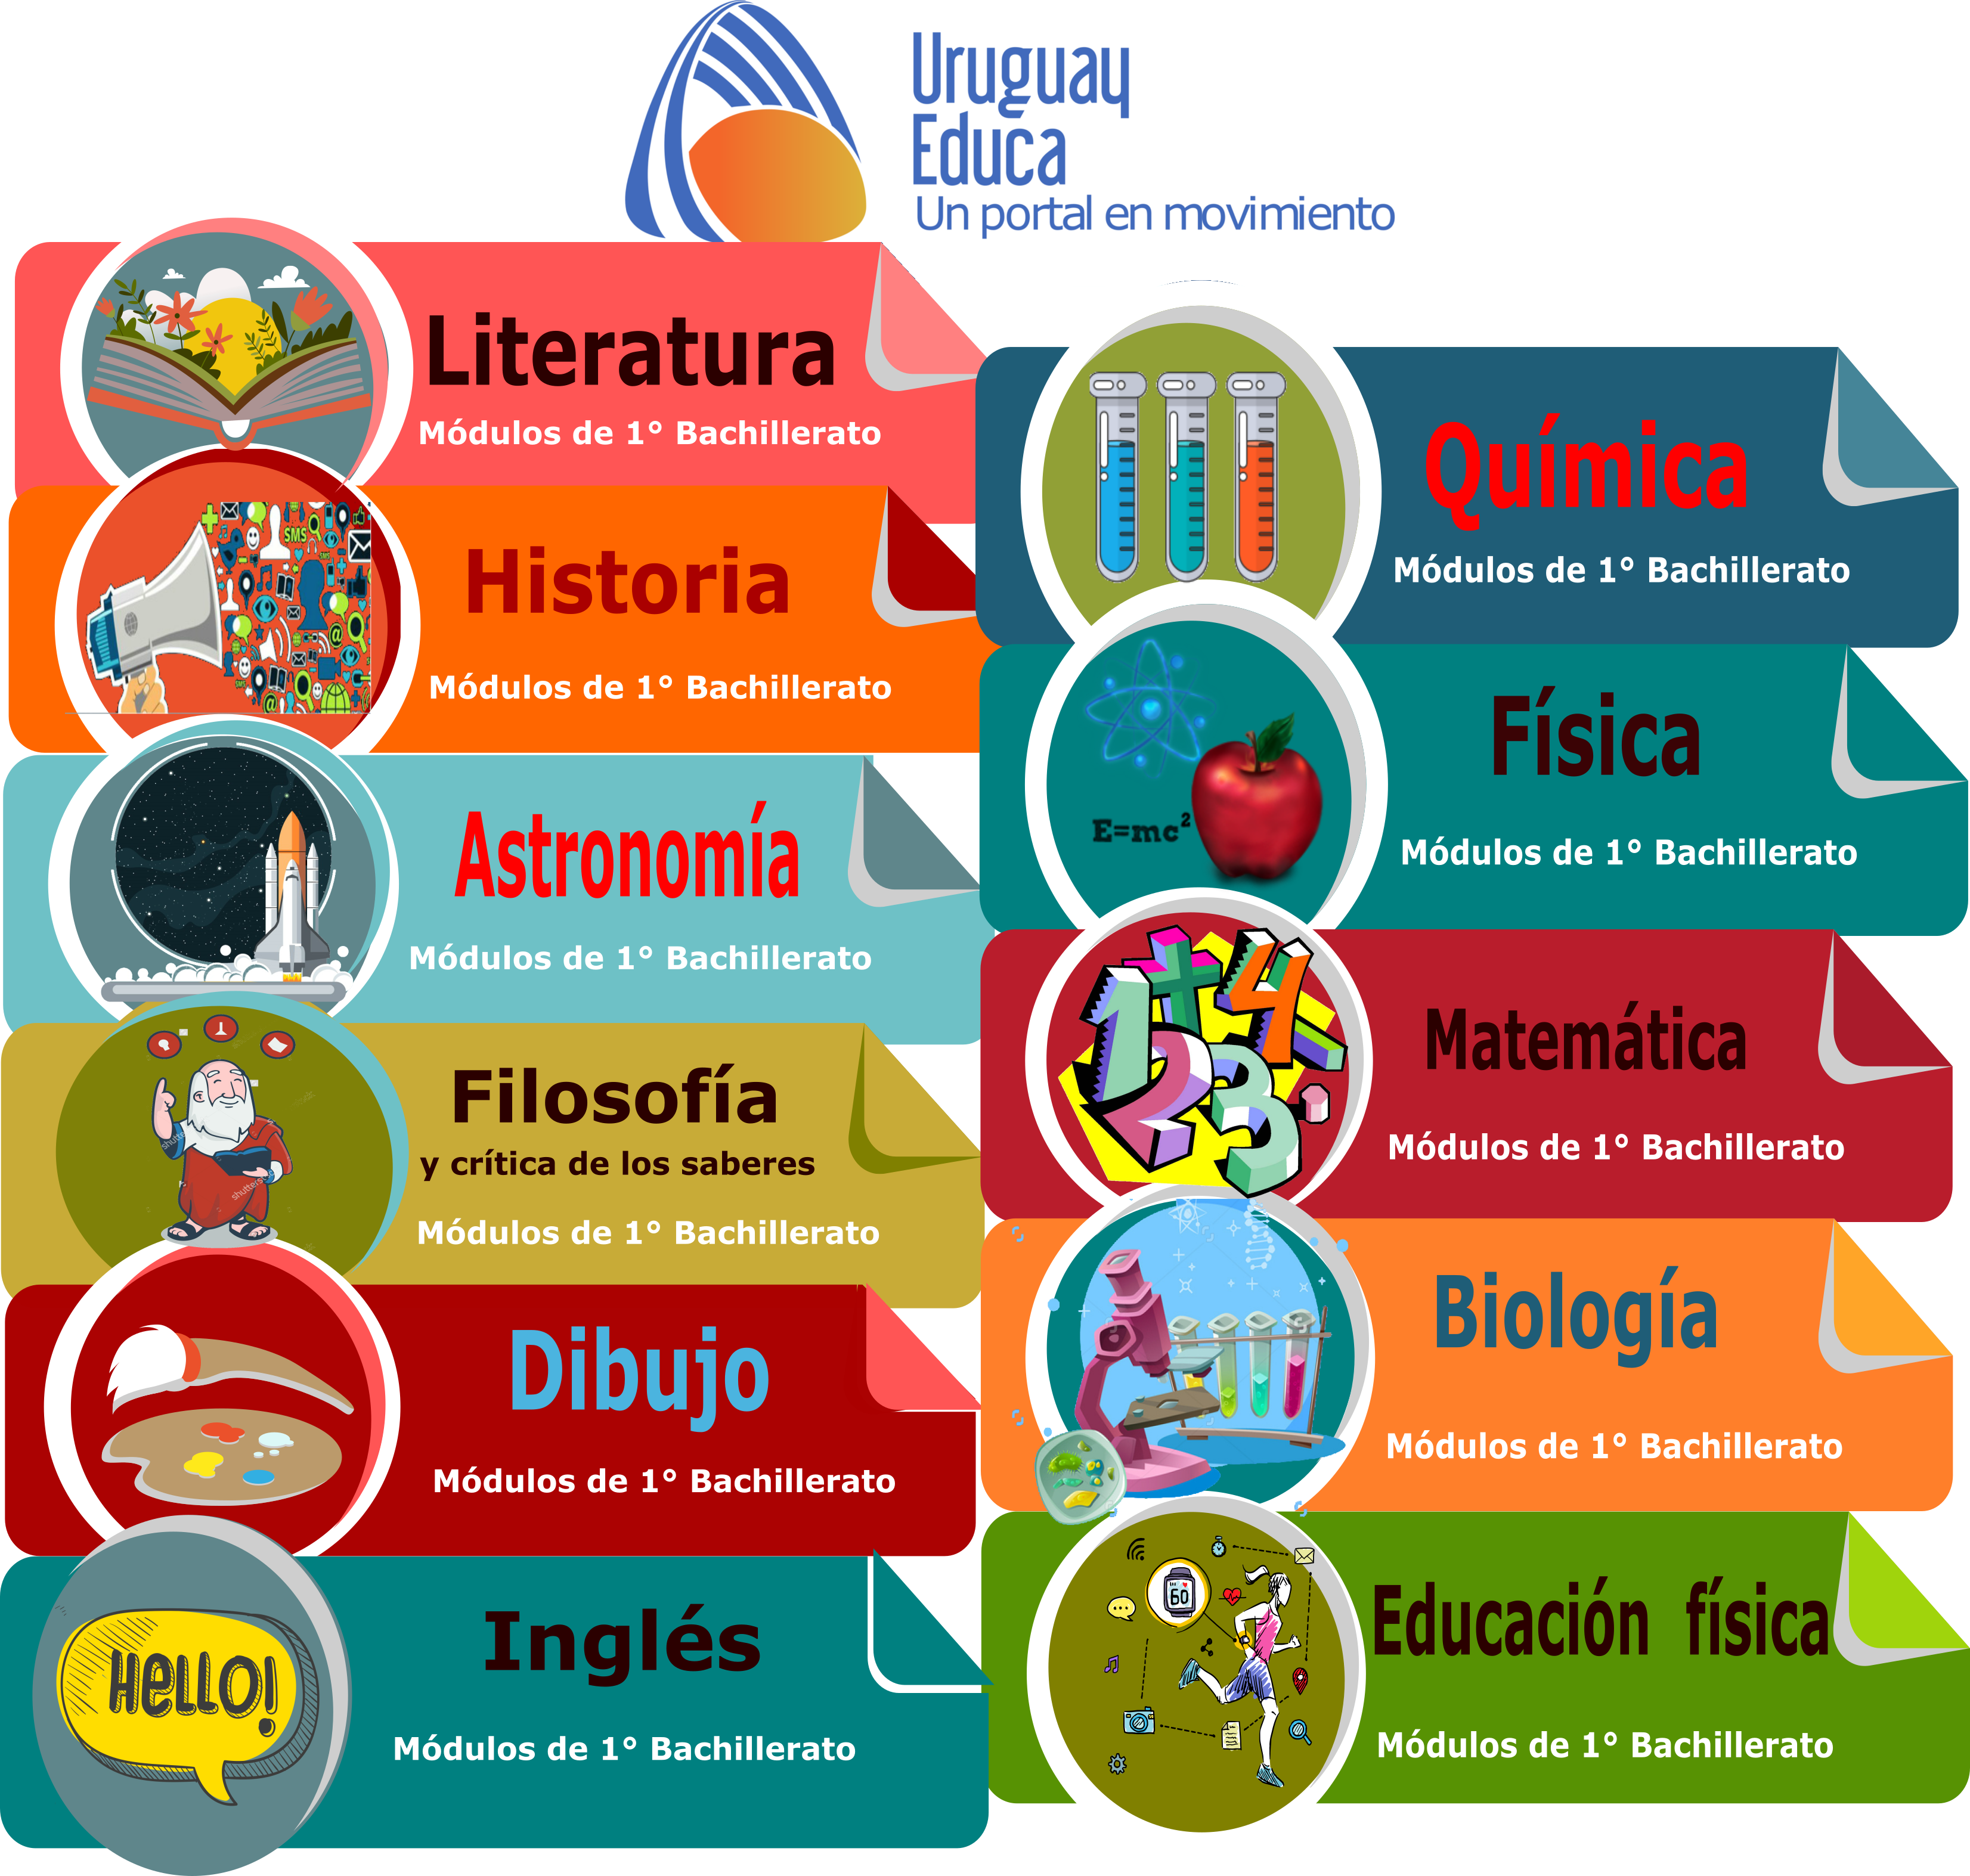 Módulos De Aprendizaje De 1º Bd Astronomía Uruguay Educa